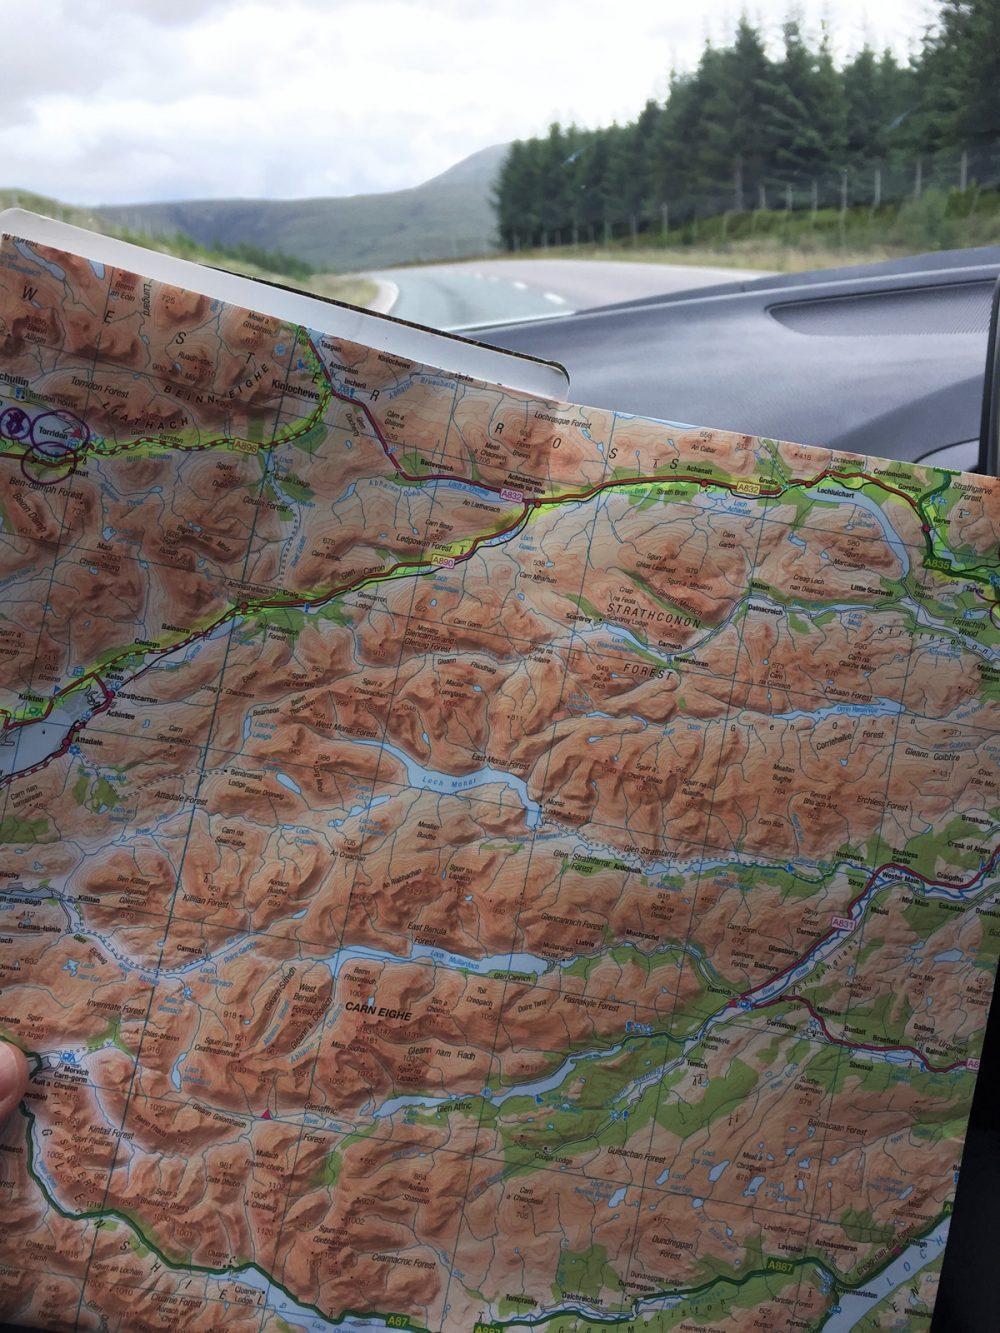 Splodz Blogz | NC500 | Map Reading OSMaps